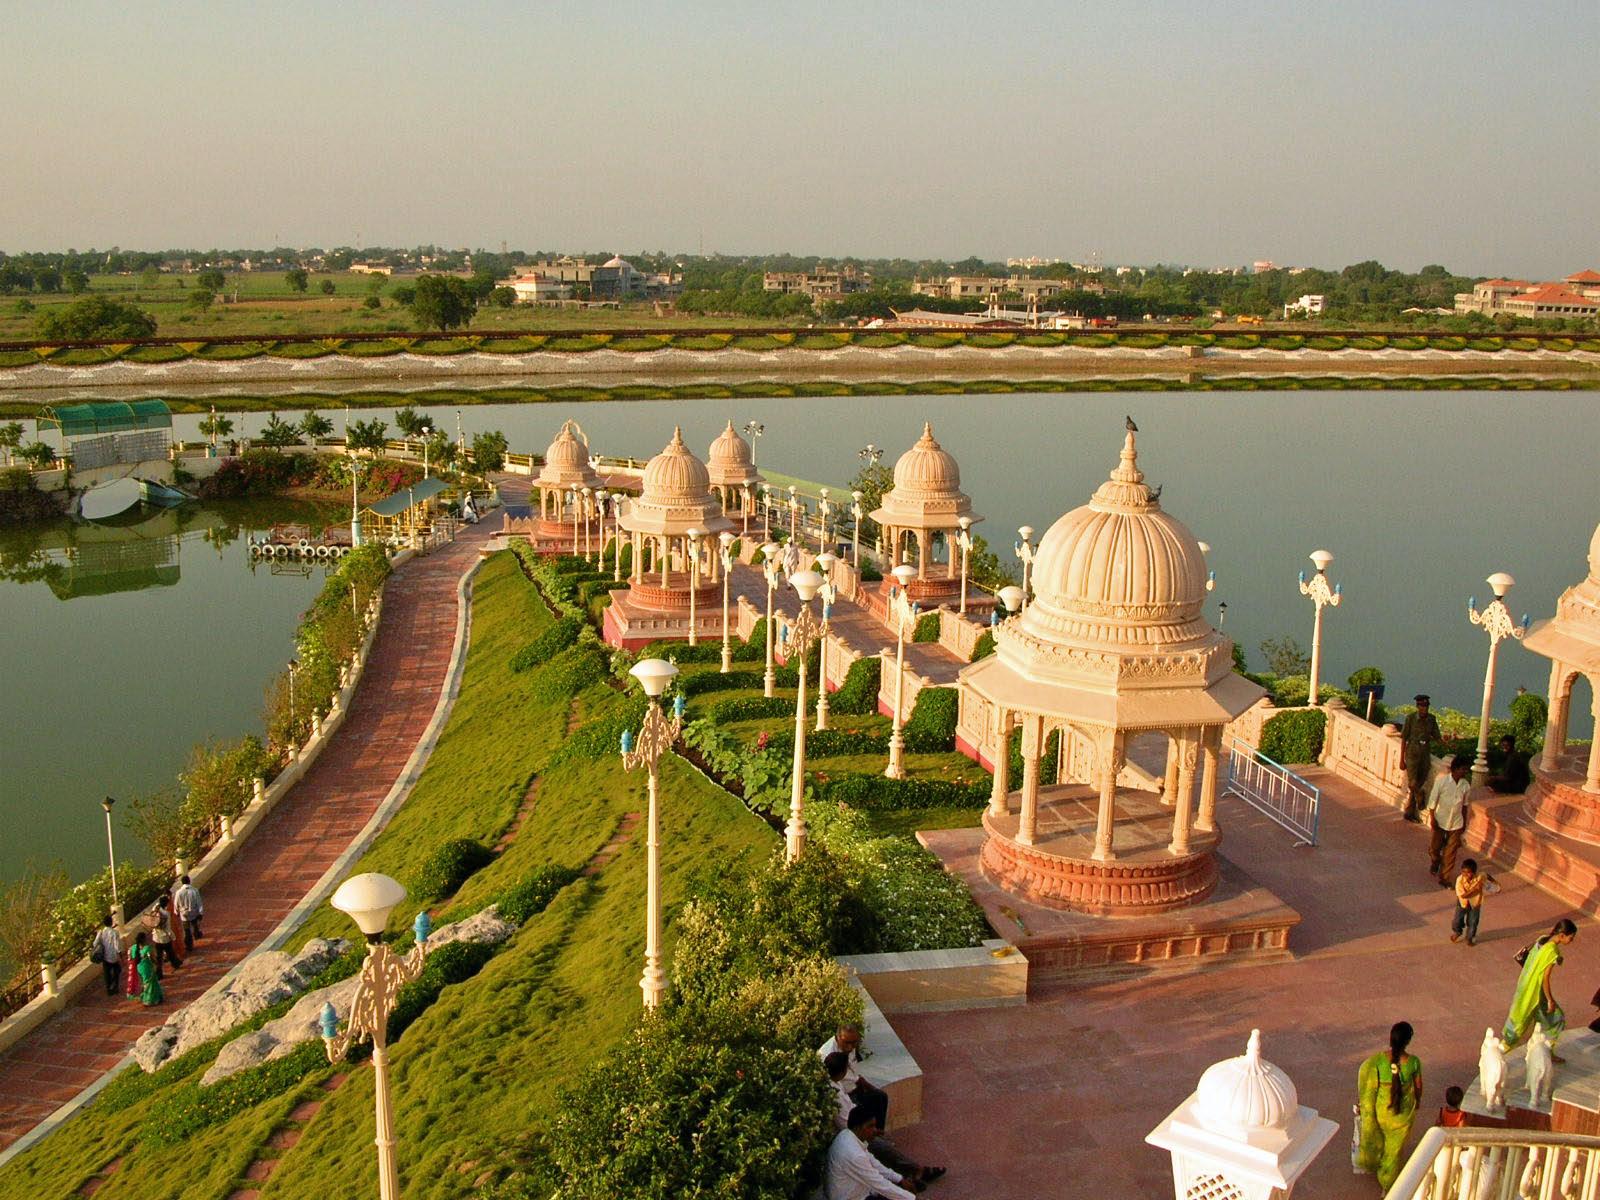 Shegaon Tourist Attractions Trawel India